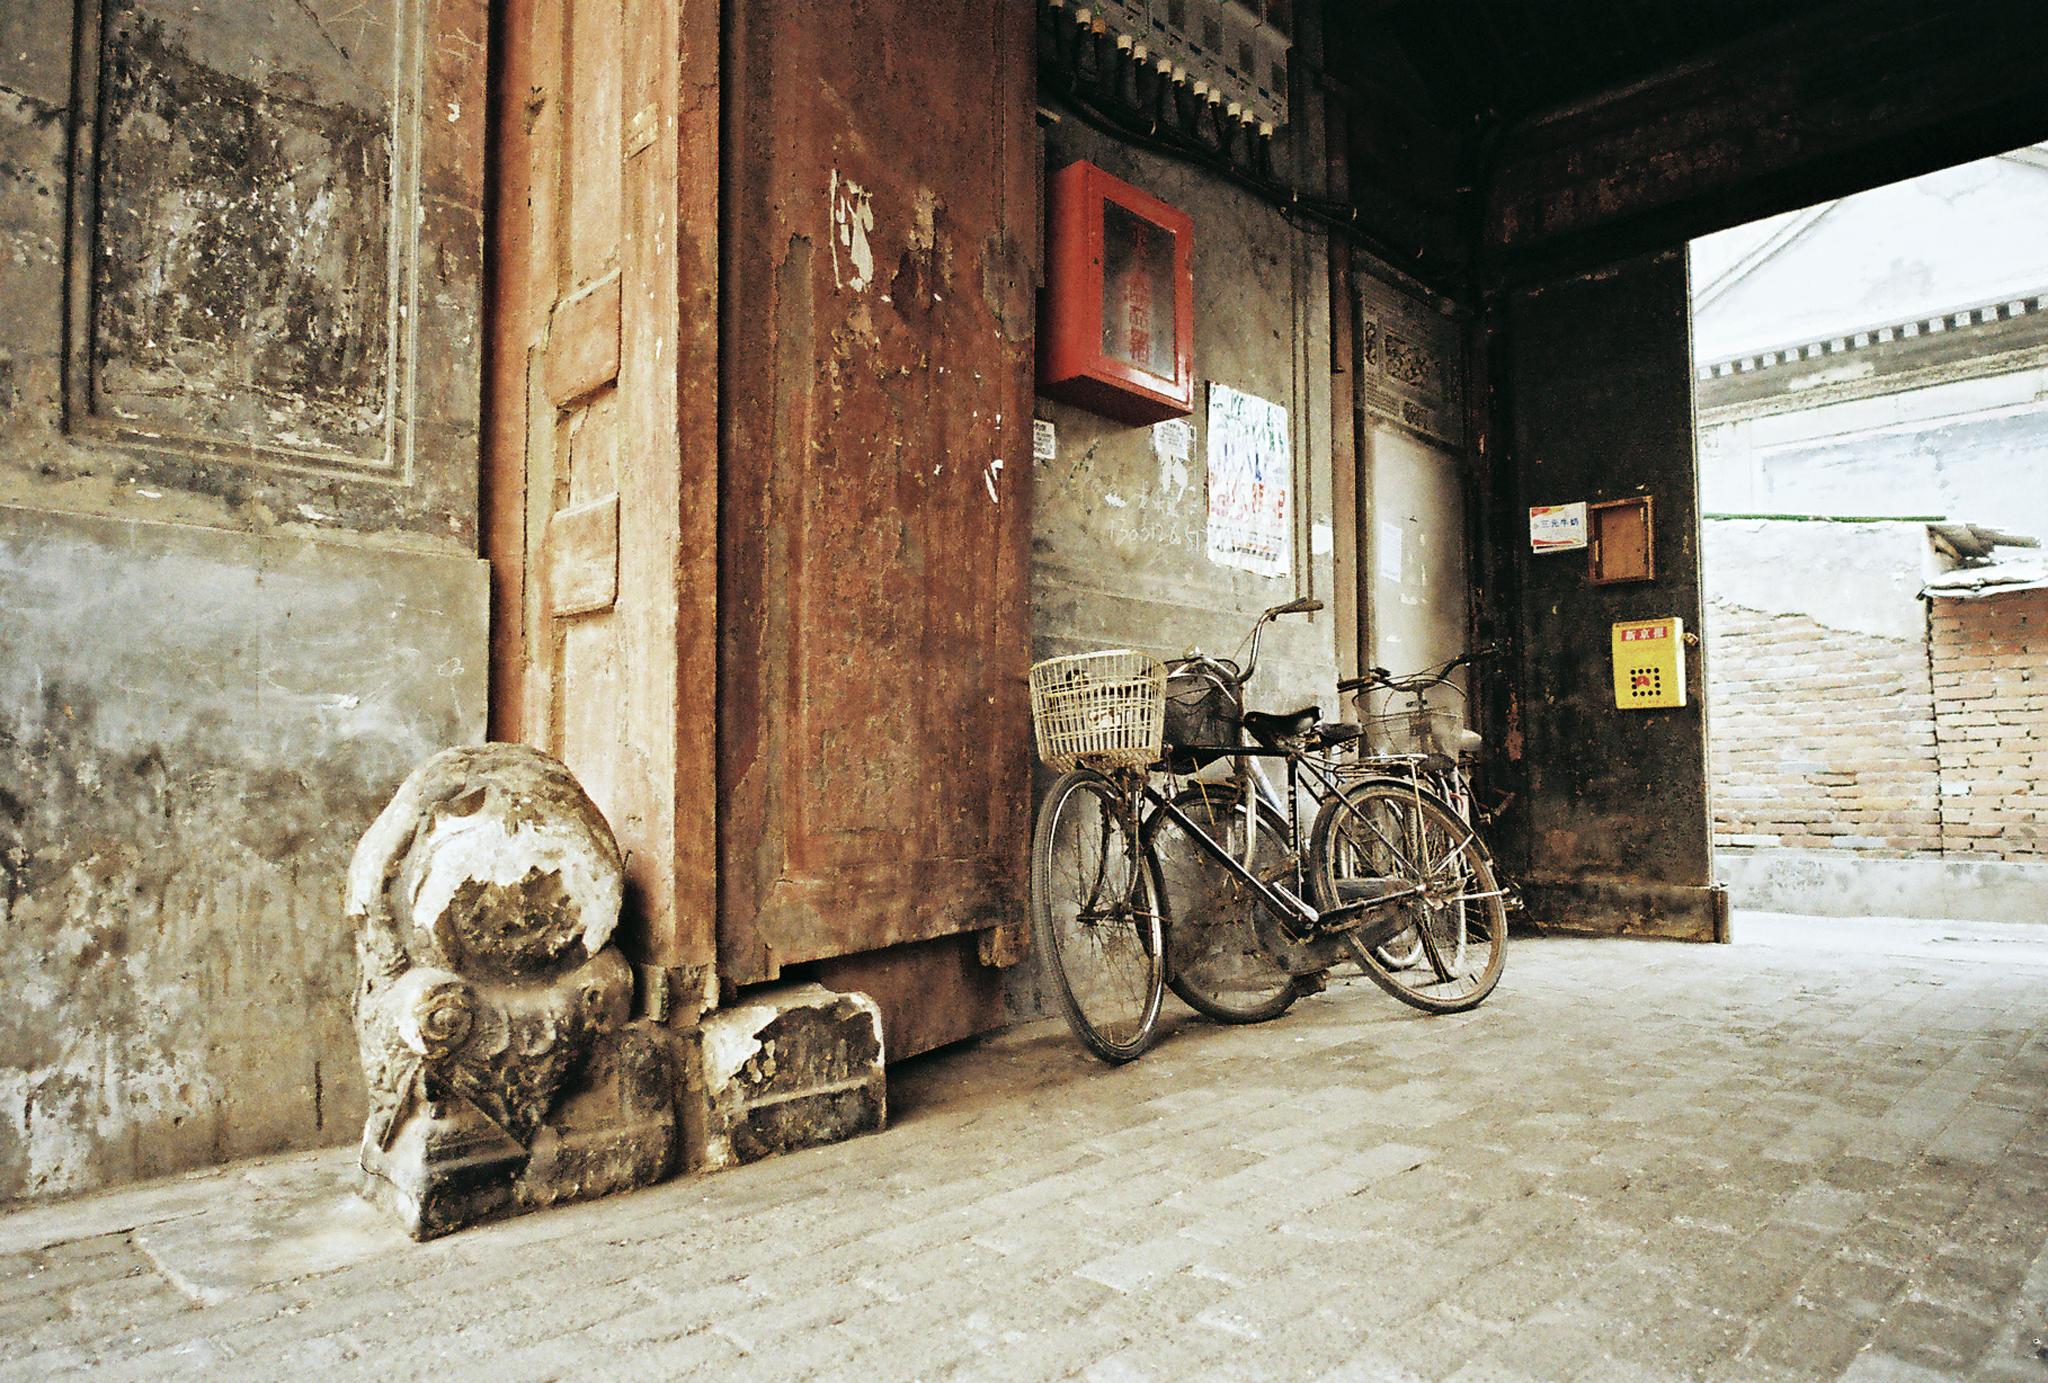 Góc Bắc Kinh